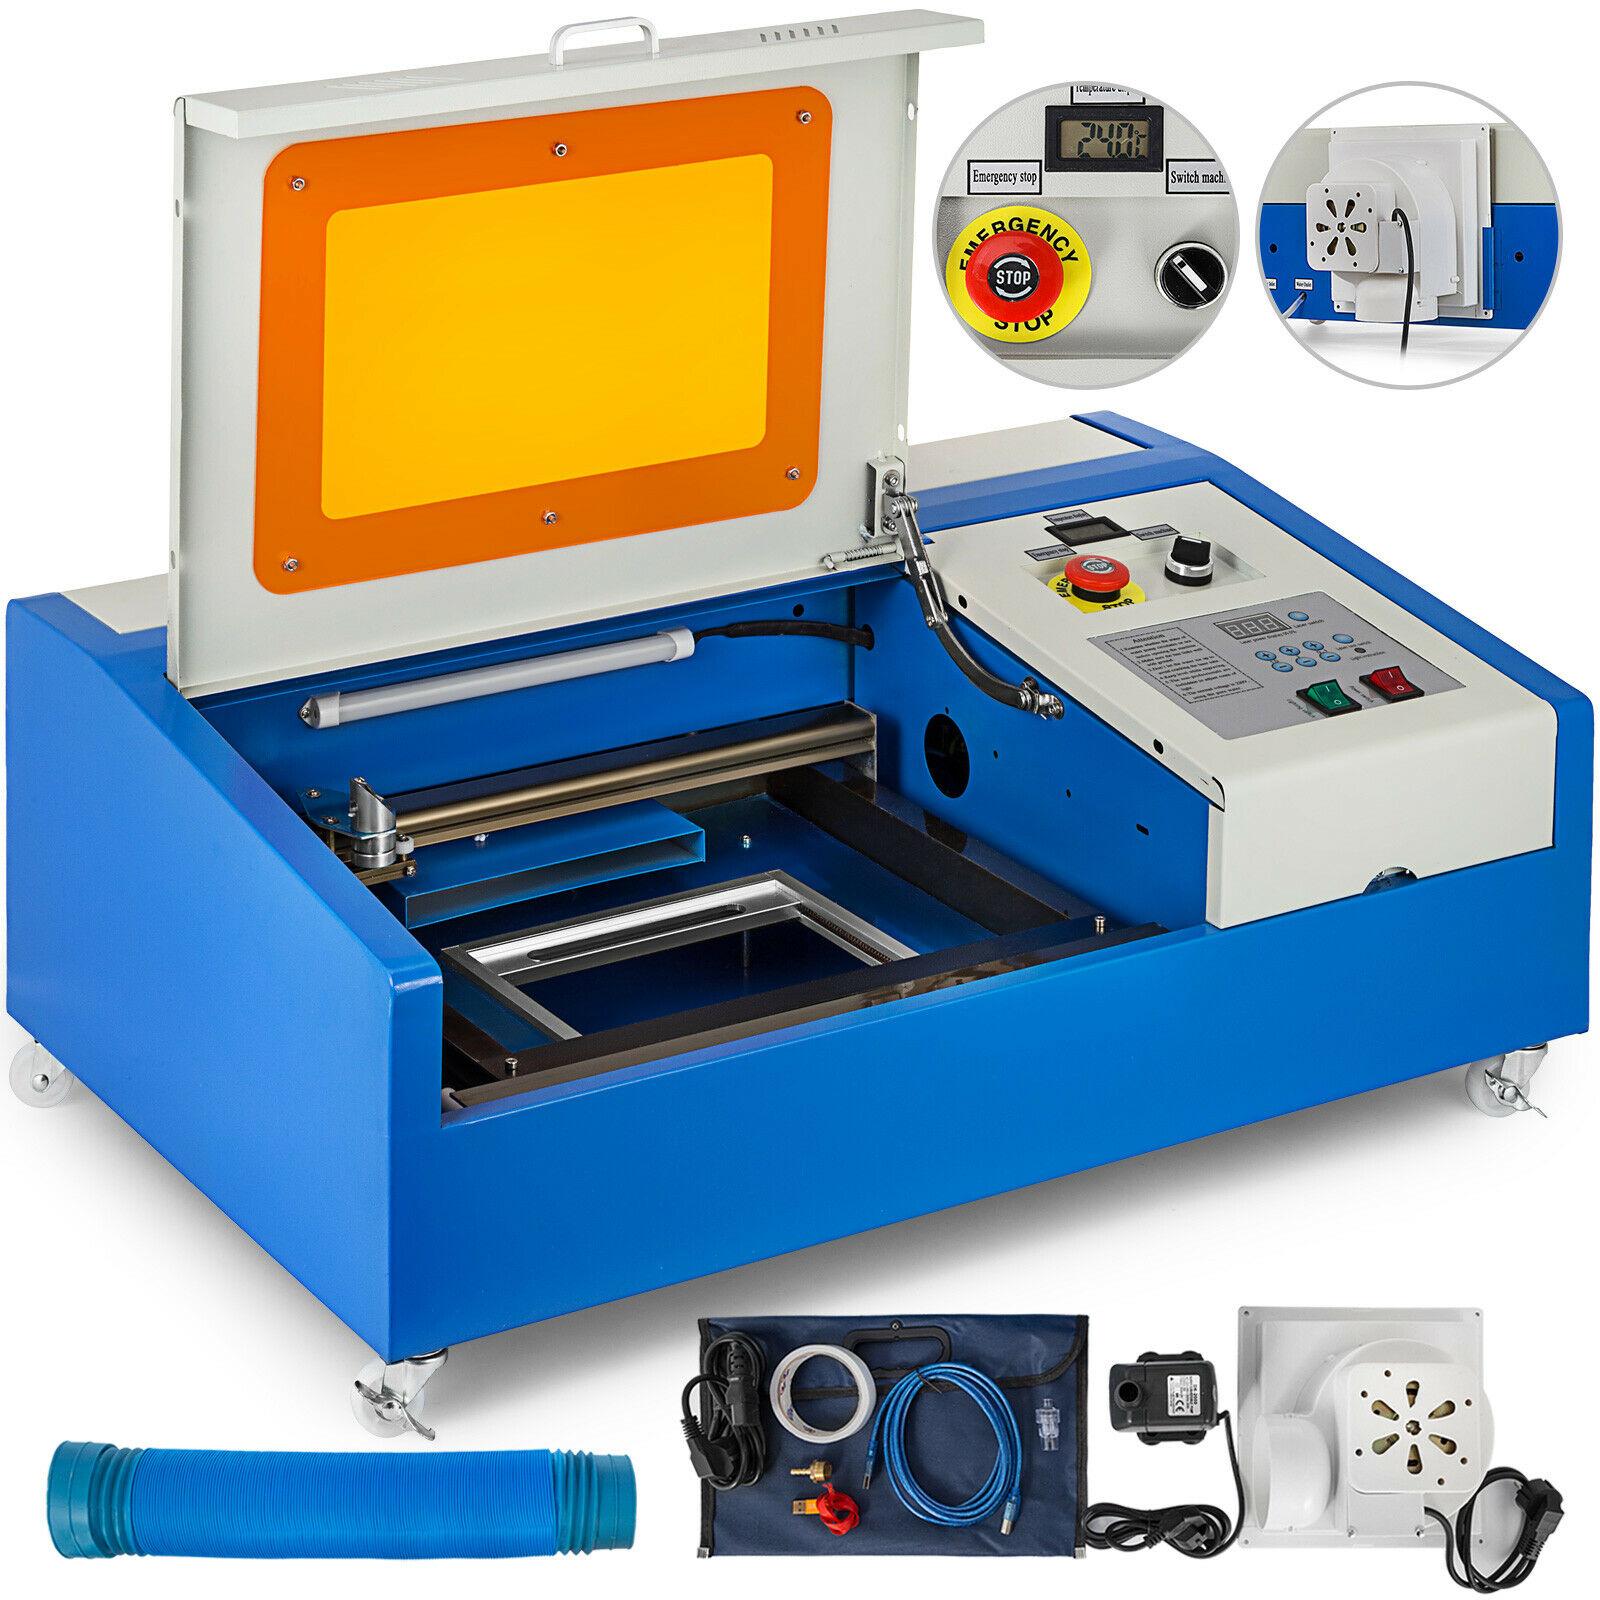 40W CO2 Laser Engraving Cutting Machine Engraver Cutter USB PORT300x200mm 220V/110V